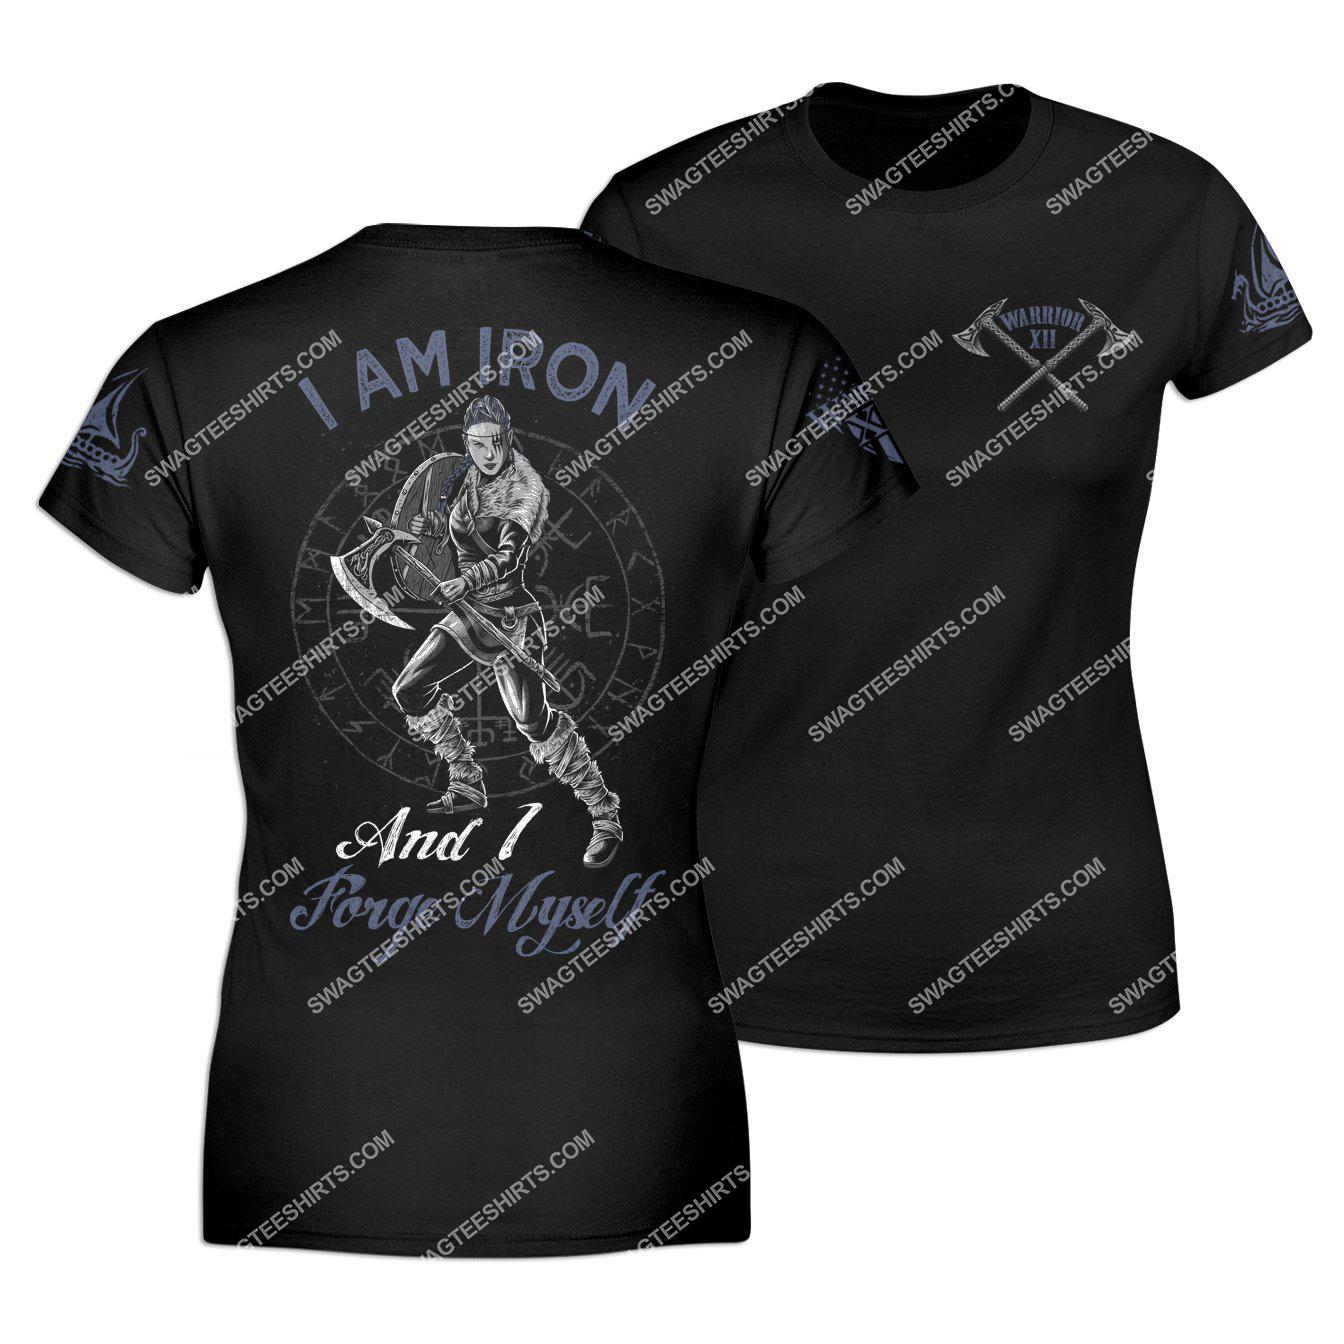 i am iron and i forge myself viking warrior shirt 1 - Copy (3)